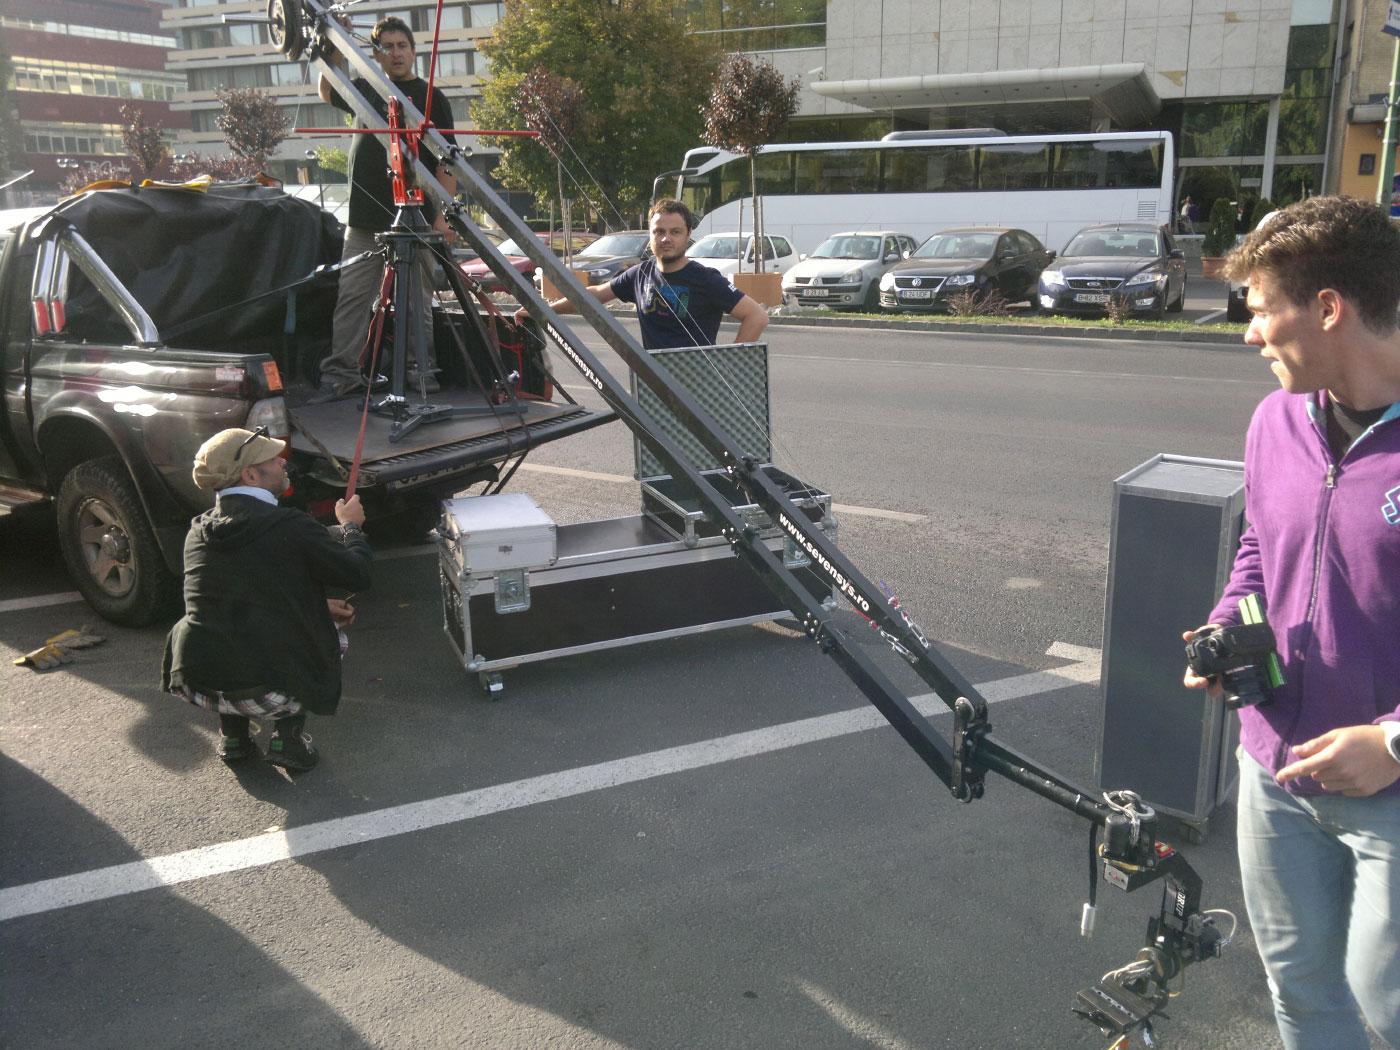 Filmare videoclip Msd